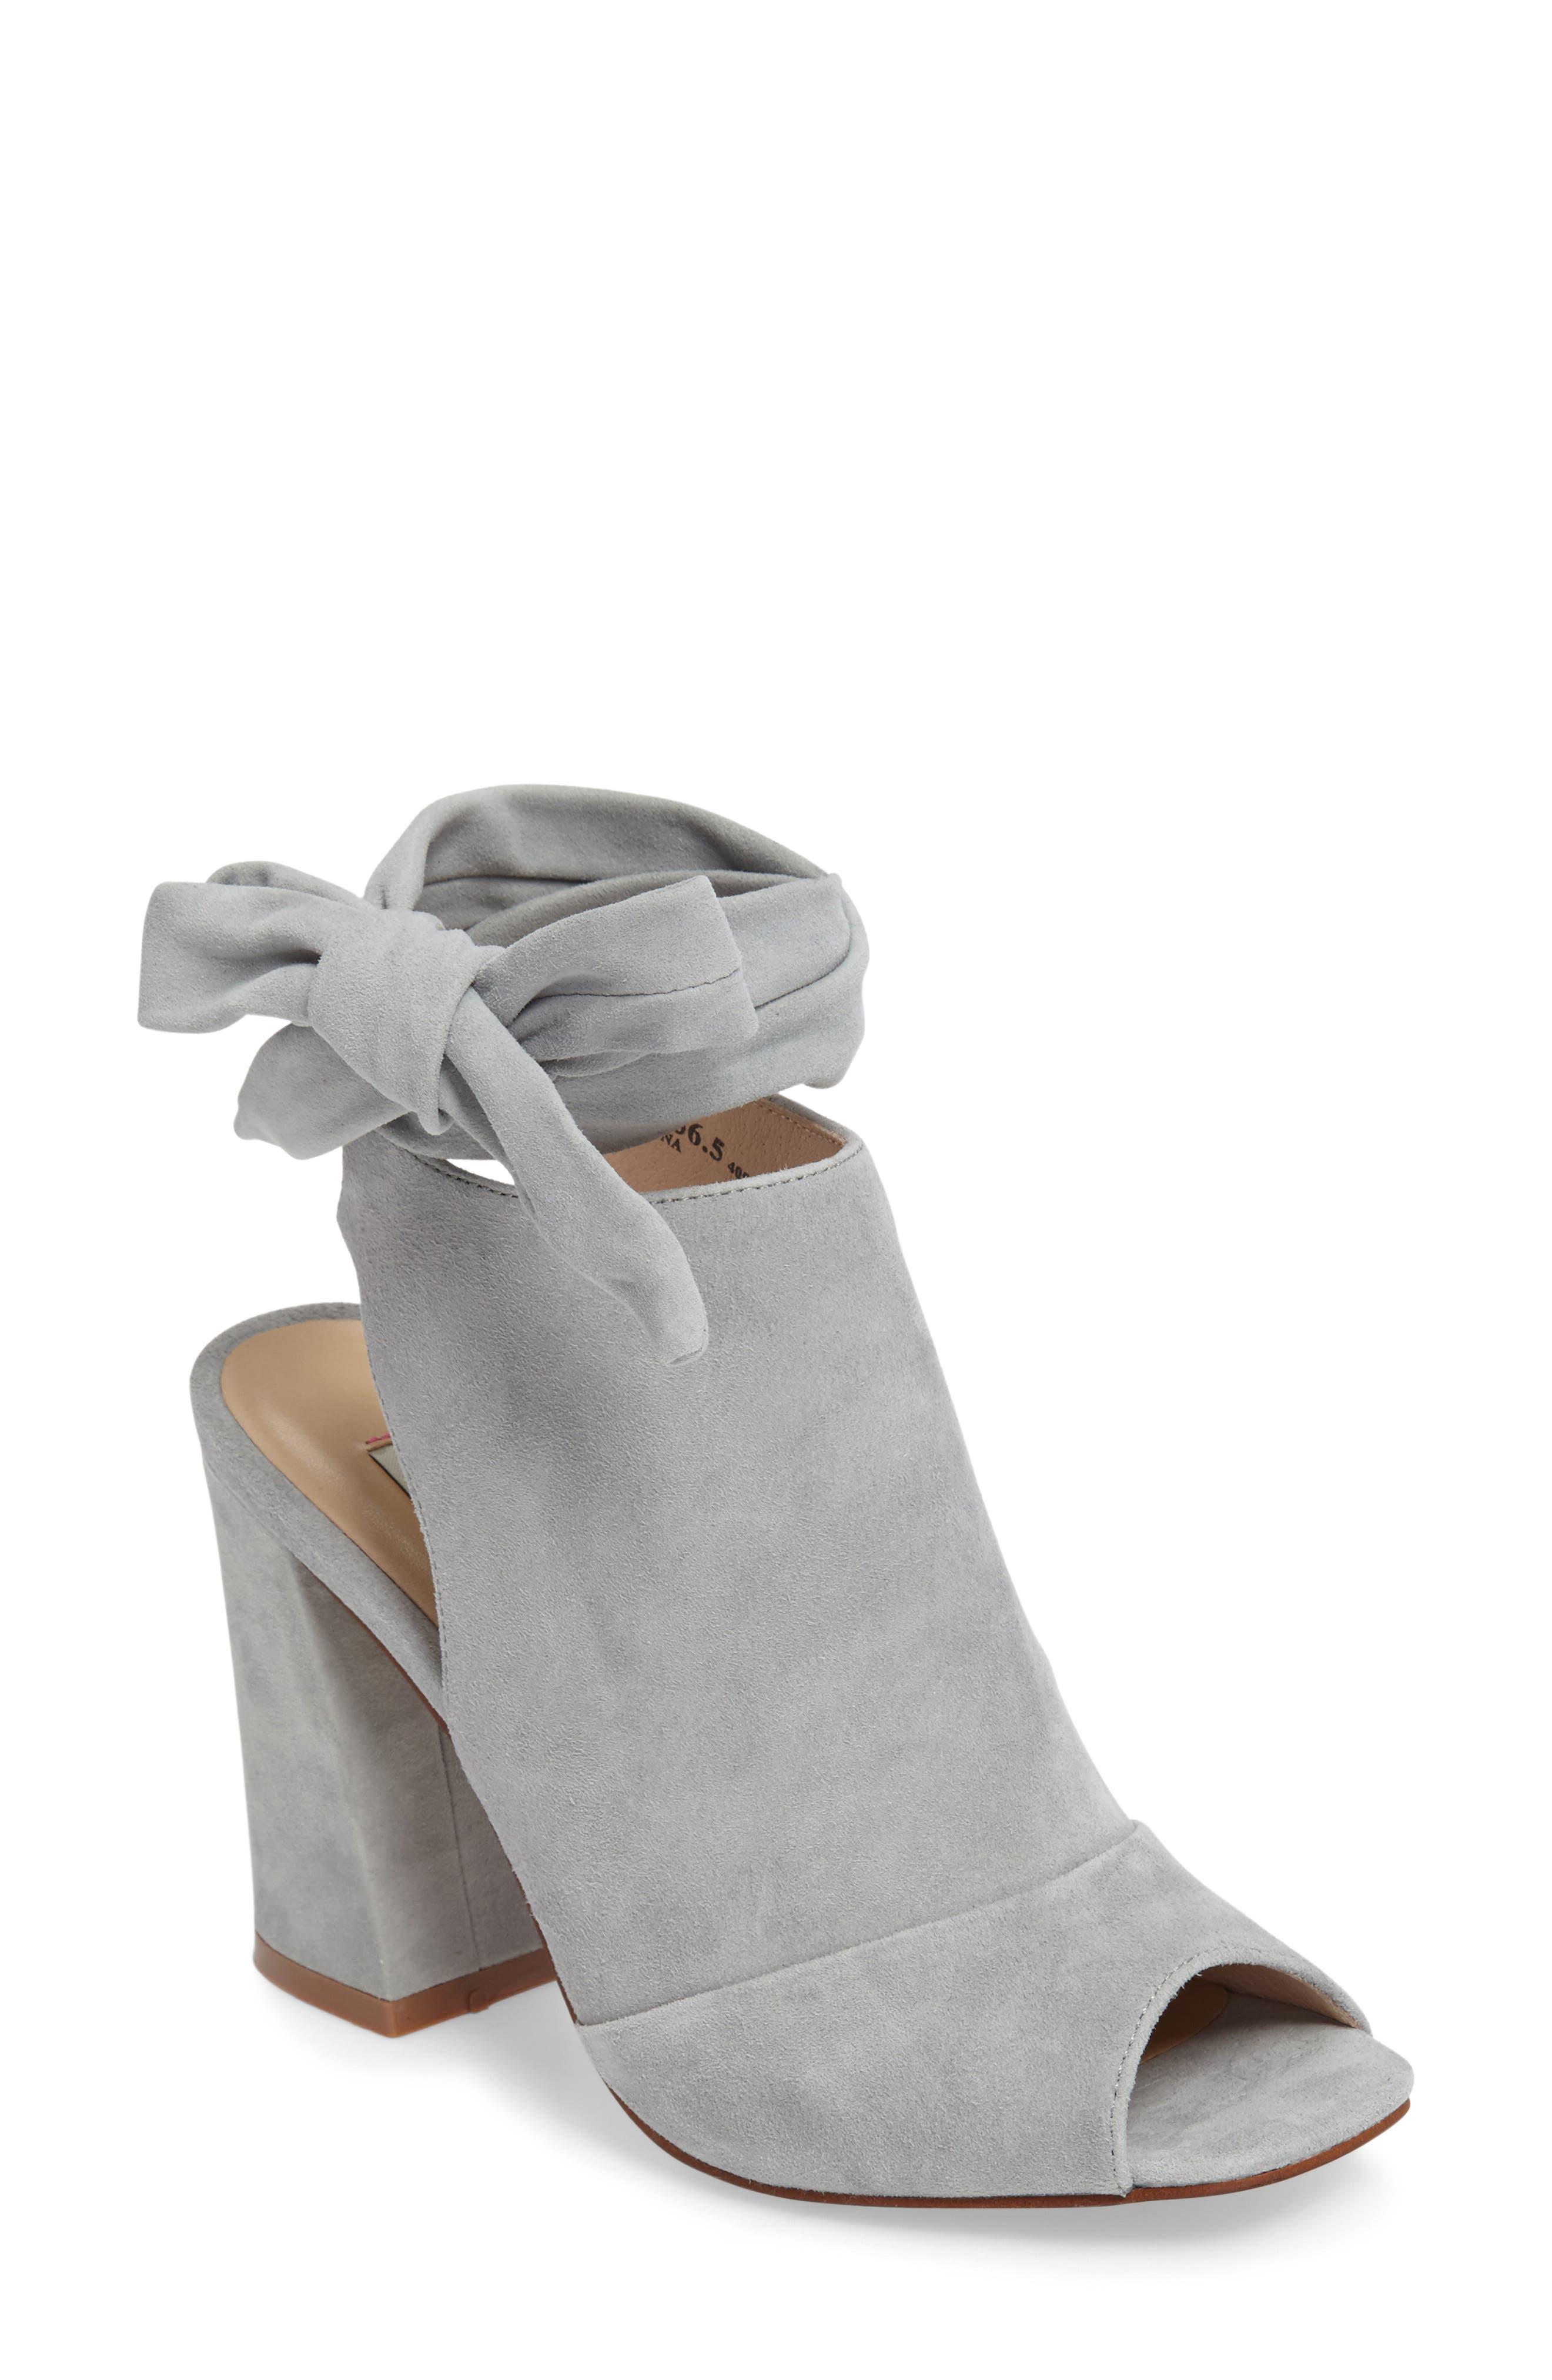 Alternate Image 1 Selected - Kristin Cavallari Leeds Peep Toe Bootie (Women)